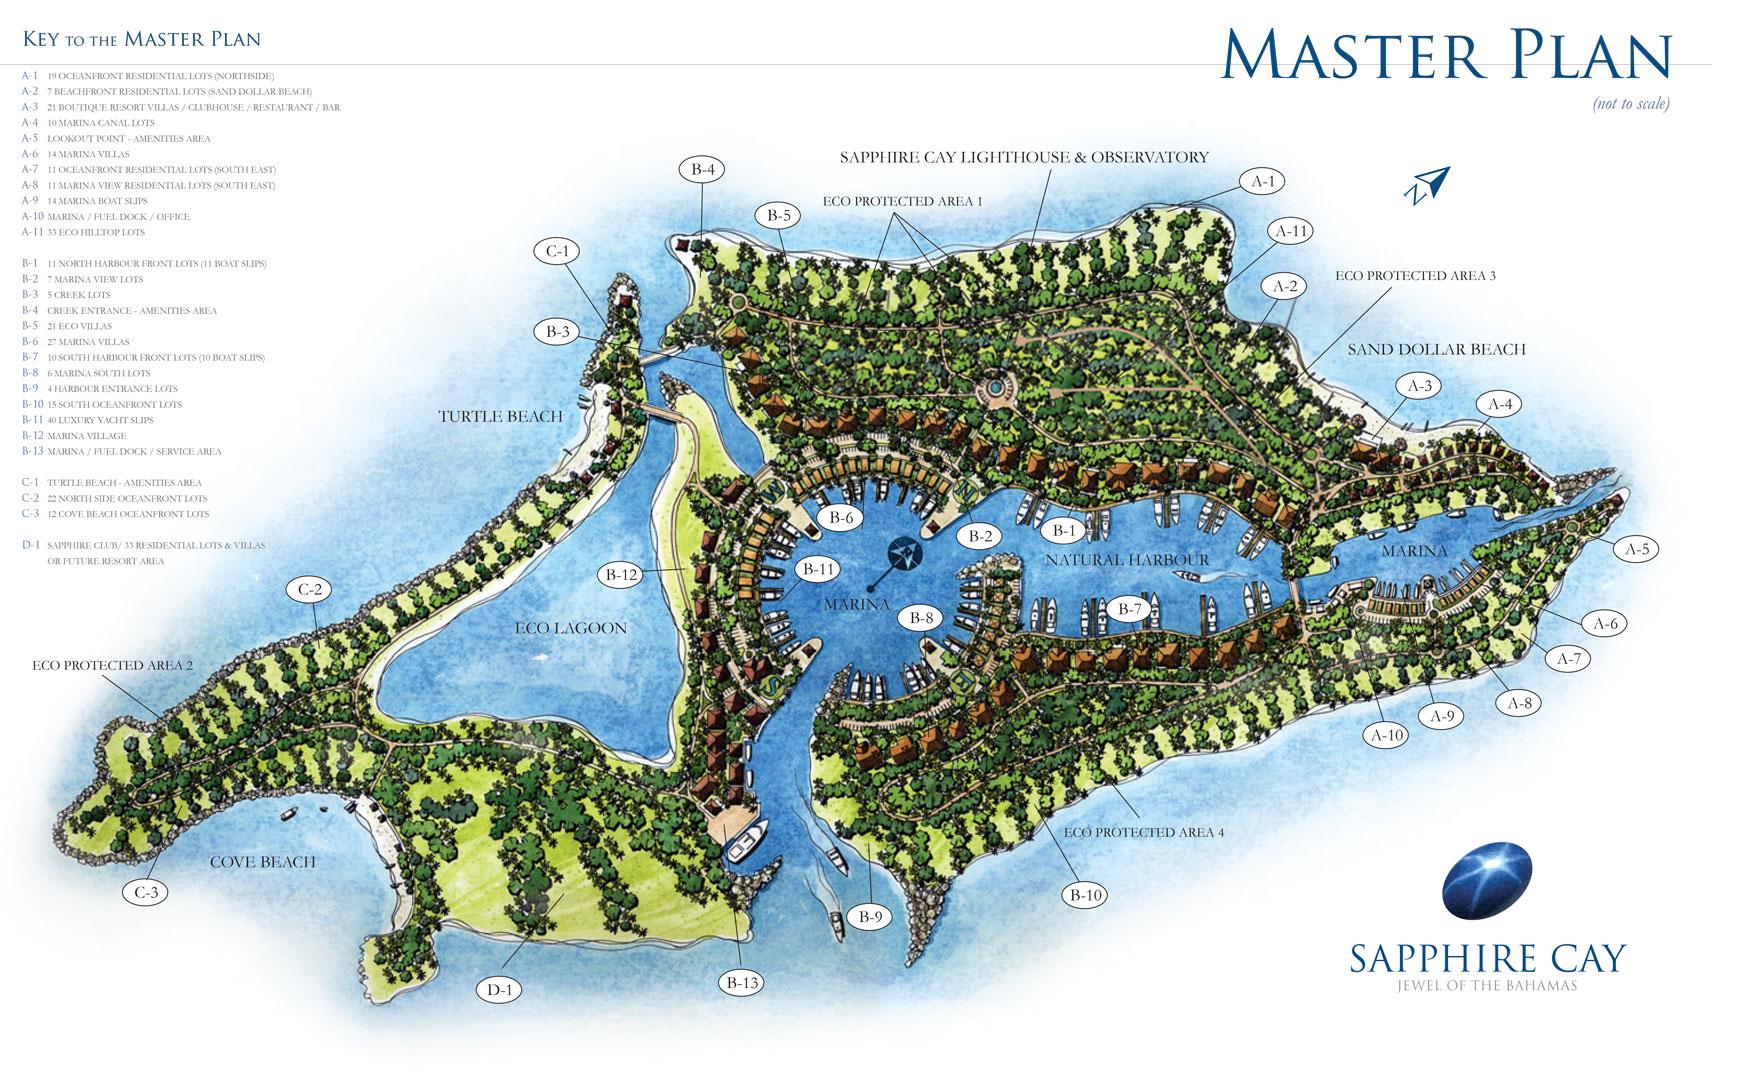 Disney Allegedly Evaluating the Bahamas' Egg Island for ... on ankara map pdf, bangkok map pdf, dalian map pdf, disneyland resort map pdf, coco cay map pdf, barcelona map pdf, gibraltar map pdf, downtown dallas map pdf, nassau map pdf, downtown disney map pdf, islands of adventure map pdf, honolulu map pdf, beijing map pdf, chengdu map pdf, lisbon map pdf, disneyland park map pdf, florence map pdf, key west map pdf, auckland map pdf, disney's animal kingdom map pdf,